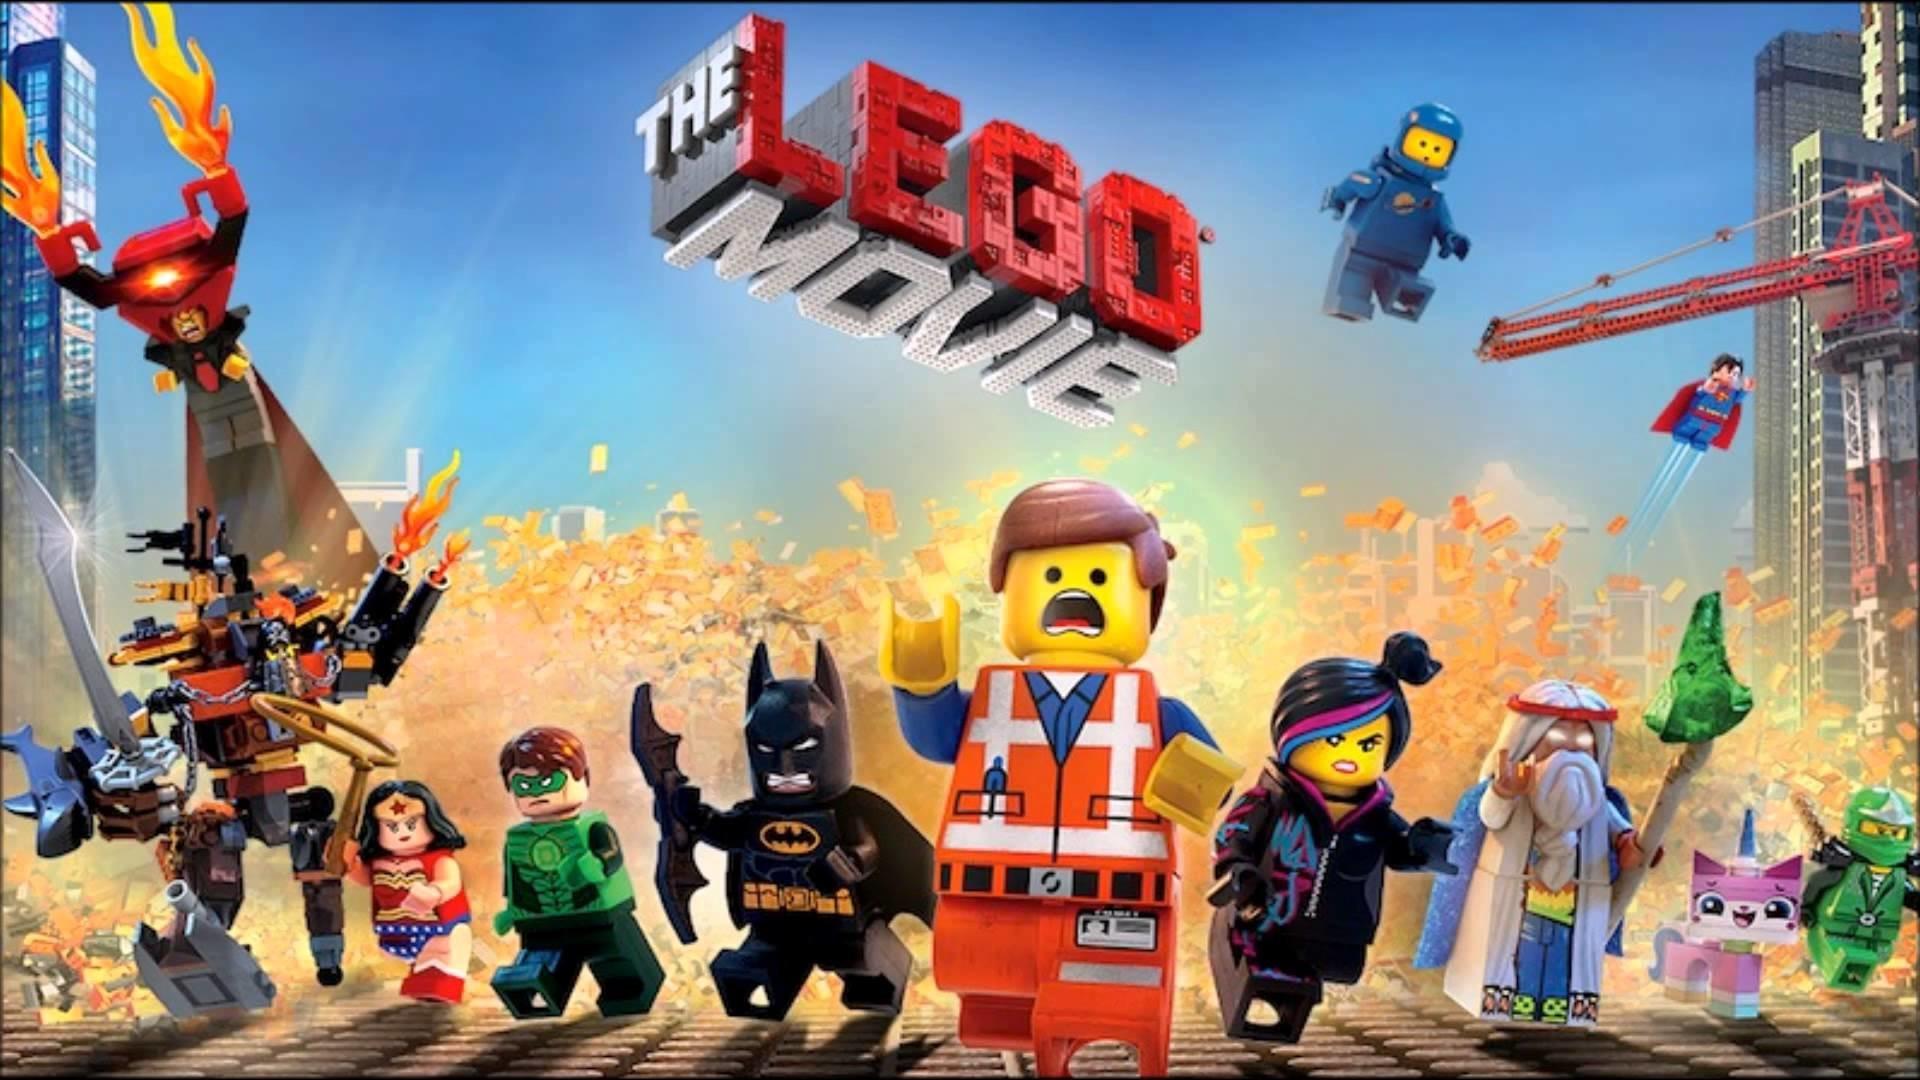 Lego Movie Desktop Wallpaper 60 Images